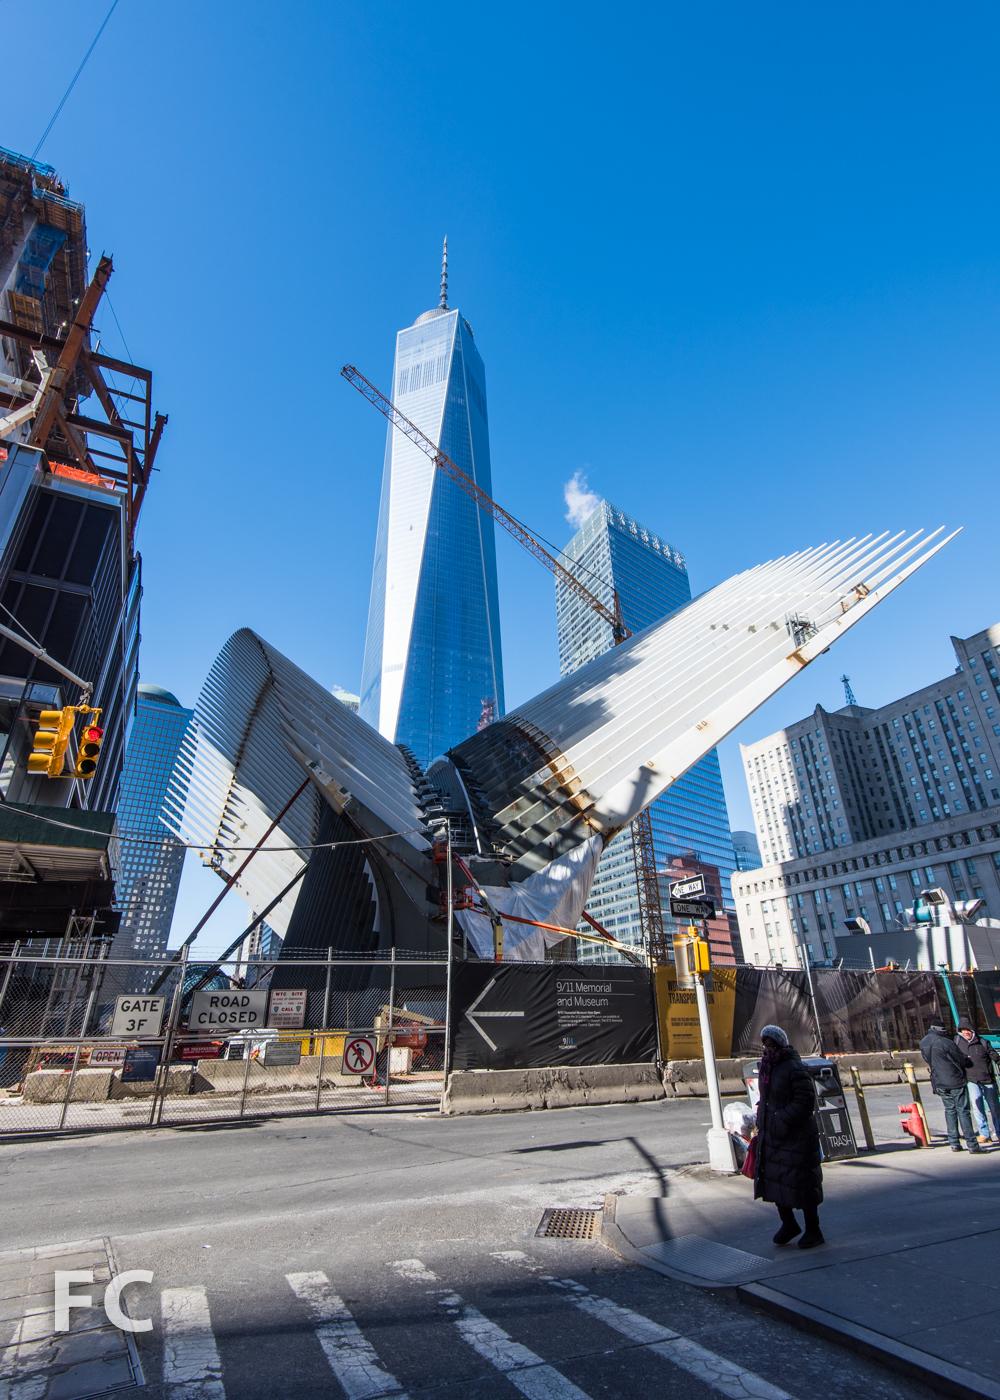 World Trade Center Transit Hub with 1World Trade Center (behind).